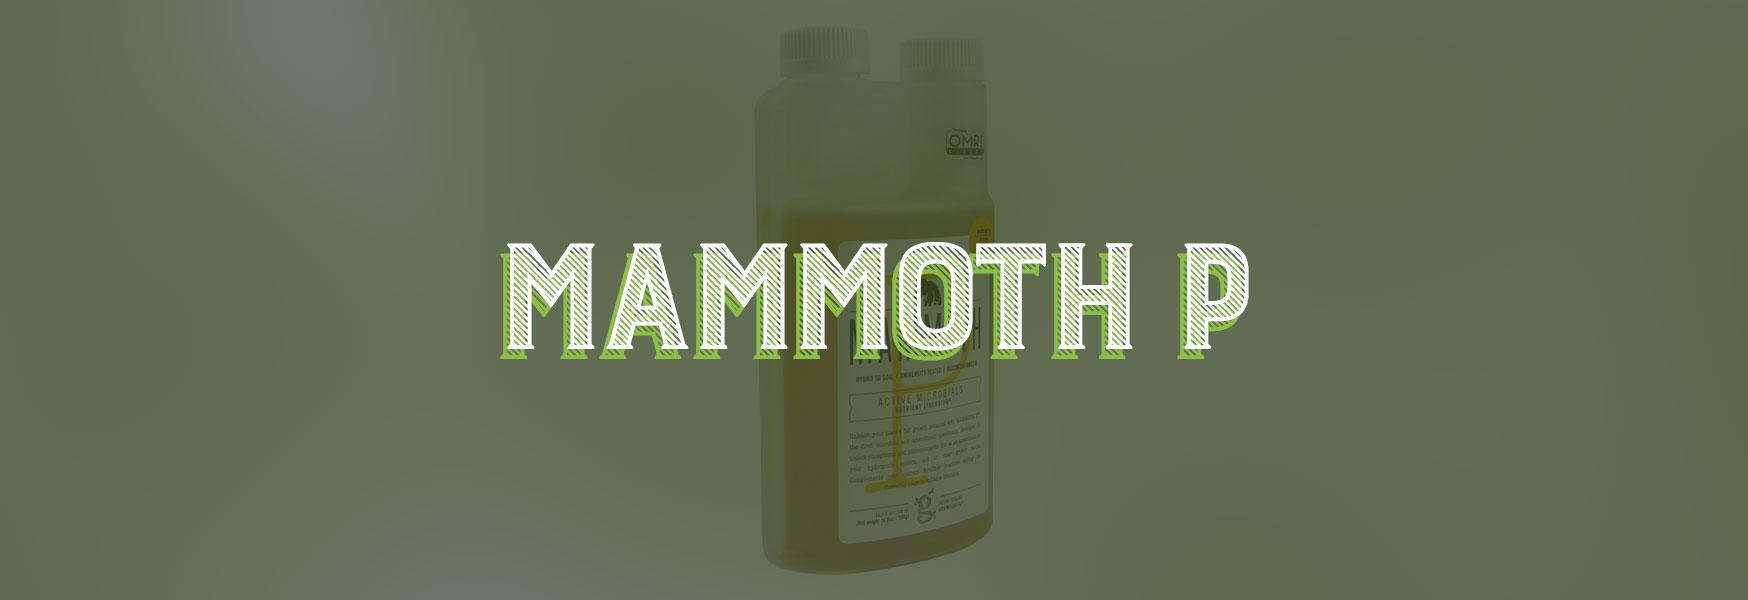 Hydroponics, Mammoth P